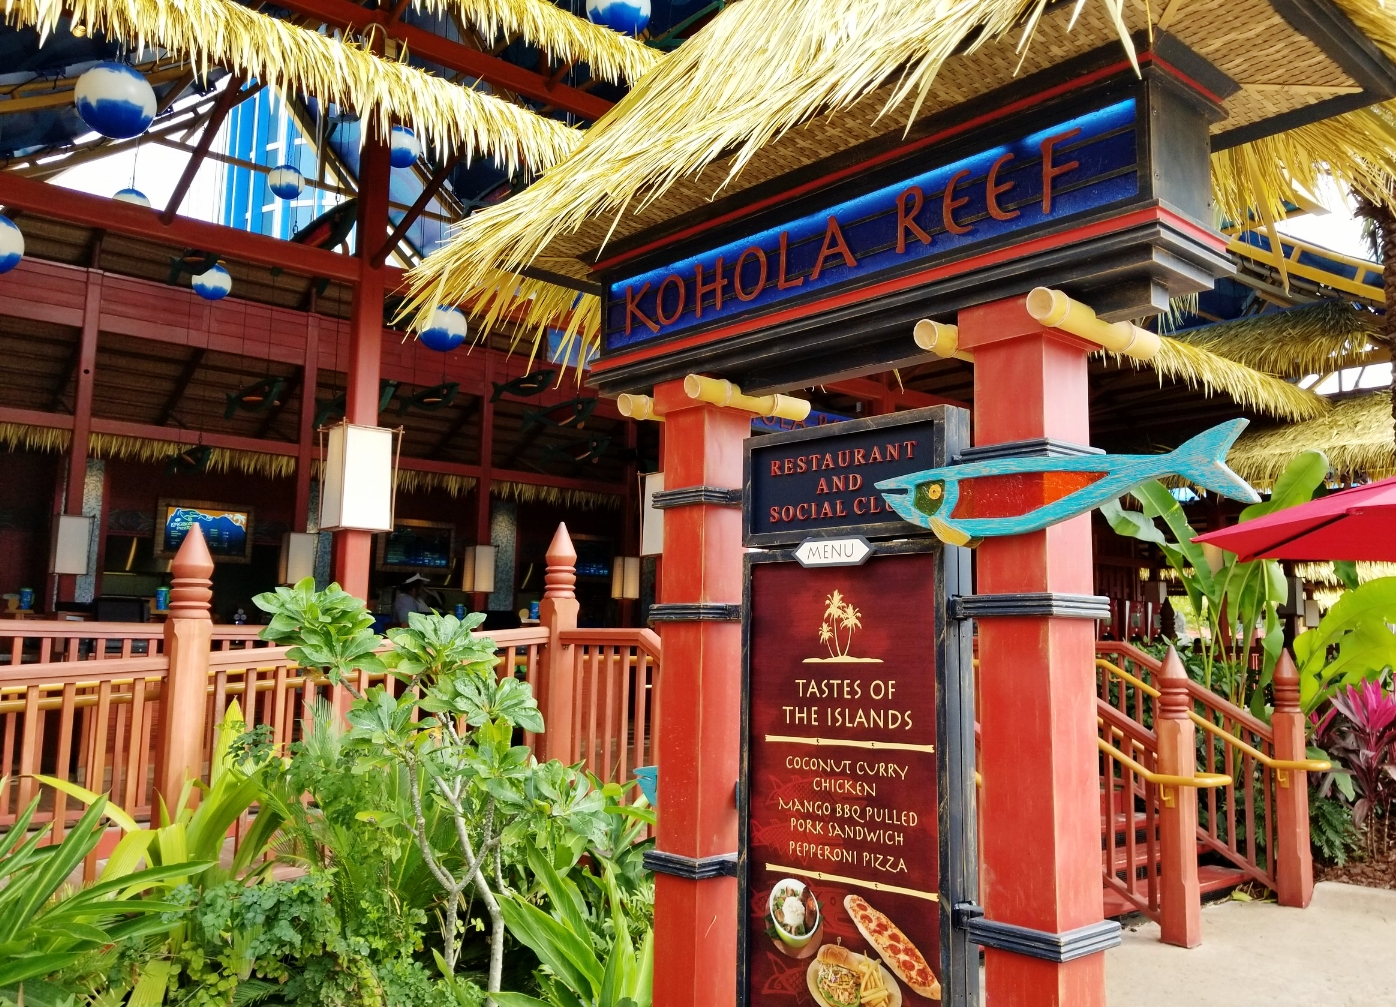 Kohola Reef Restaurant and Social Club at Universal's Volcano Bay